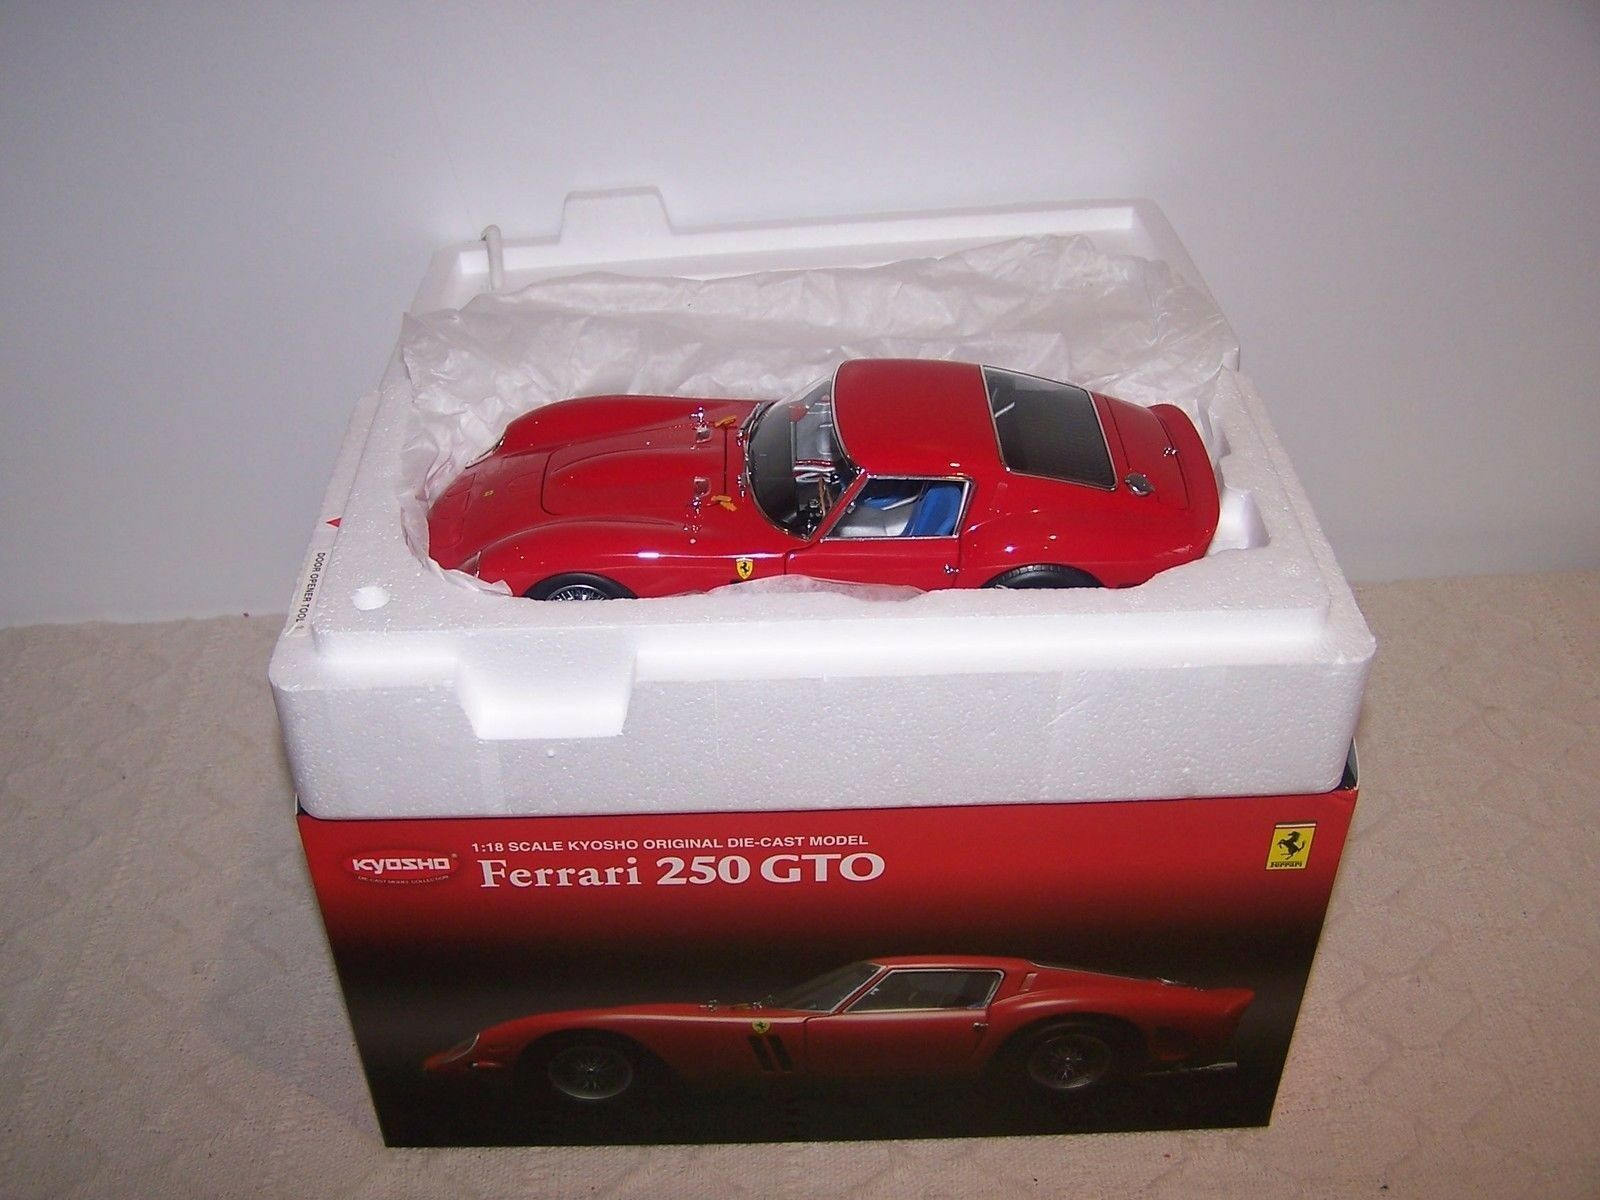 1 18 Kyosho Ferrari 250 Gto Red r - New Inovp - Rarity